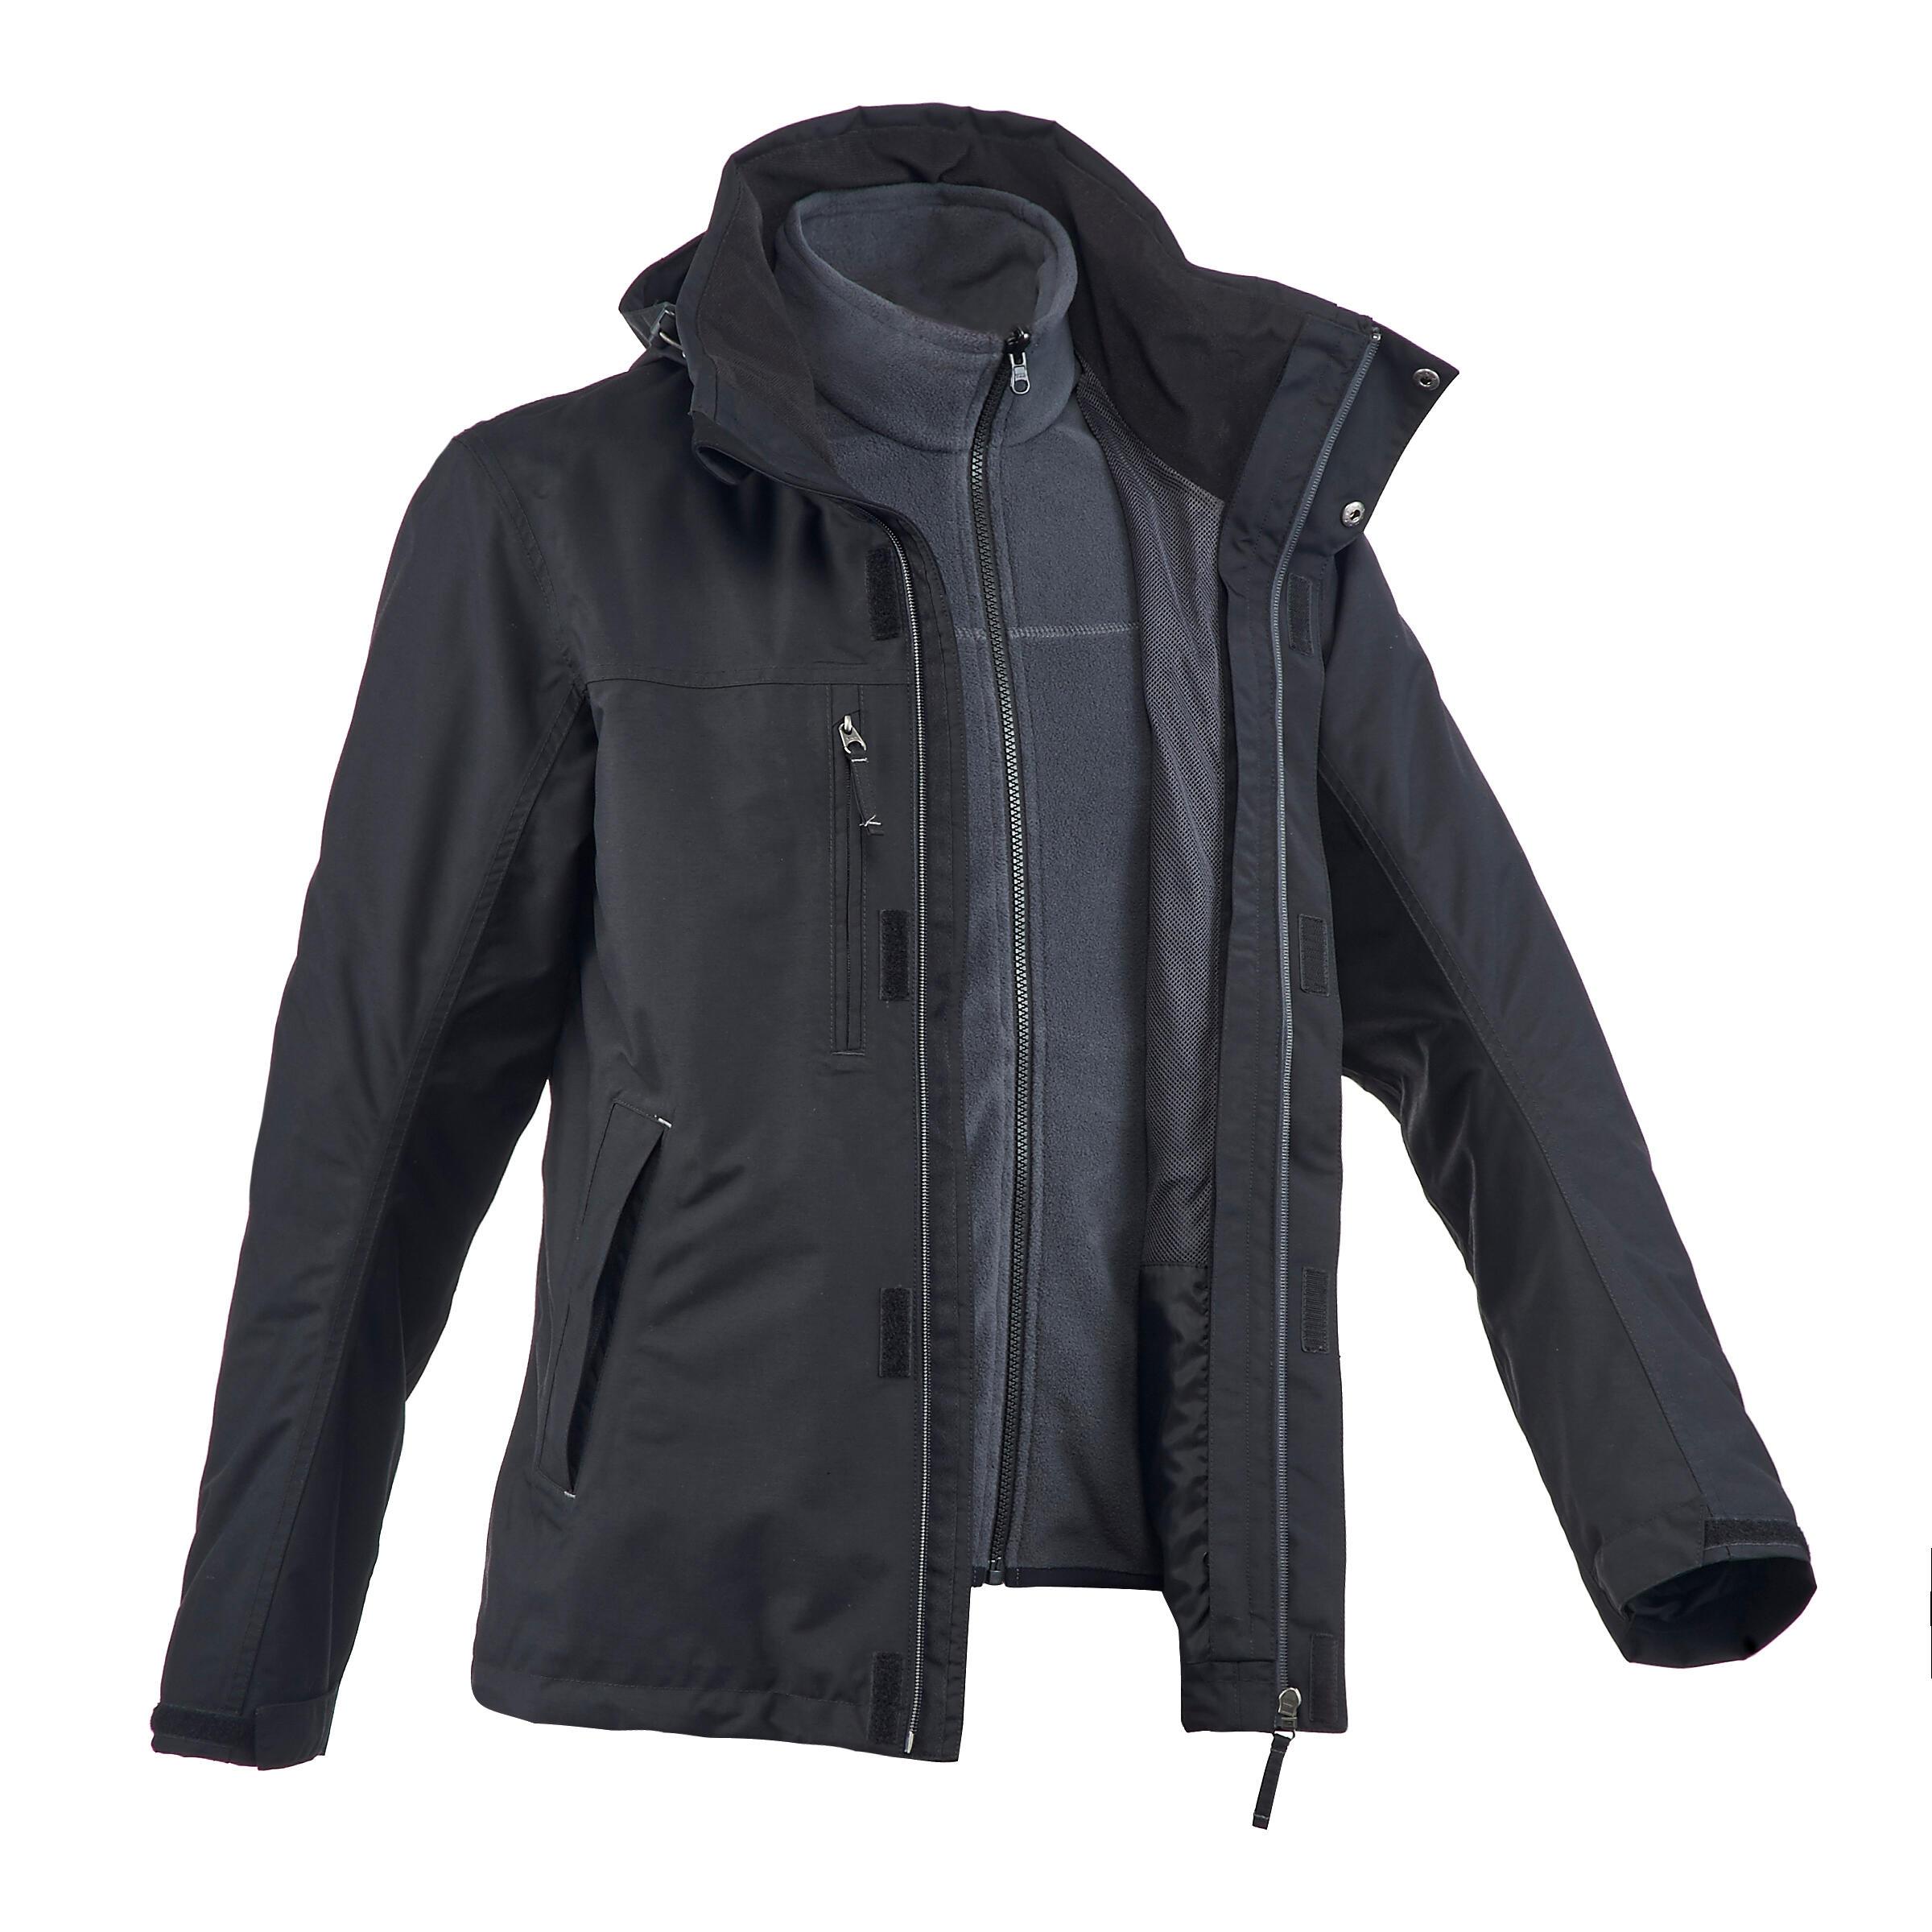 Rainwarm 100 3-in-1 mens black trekking jacket